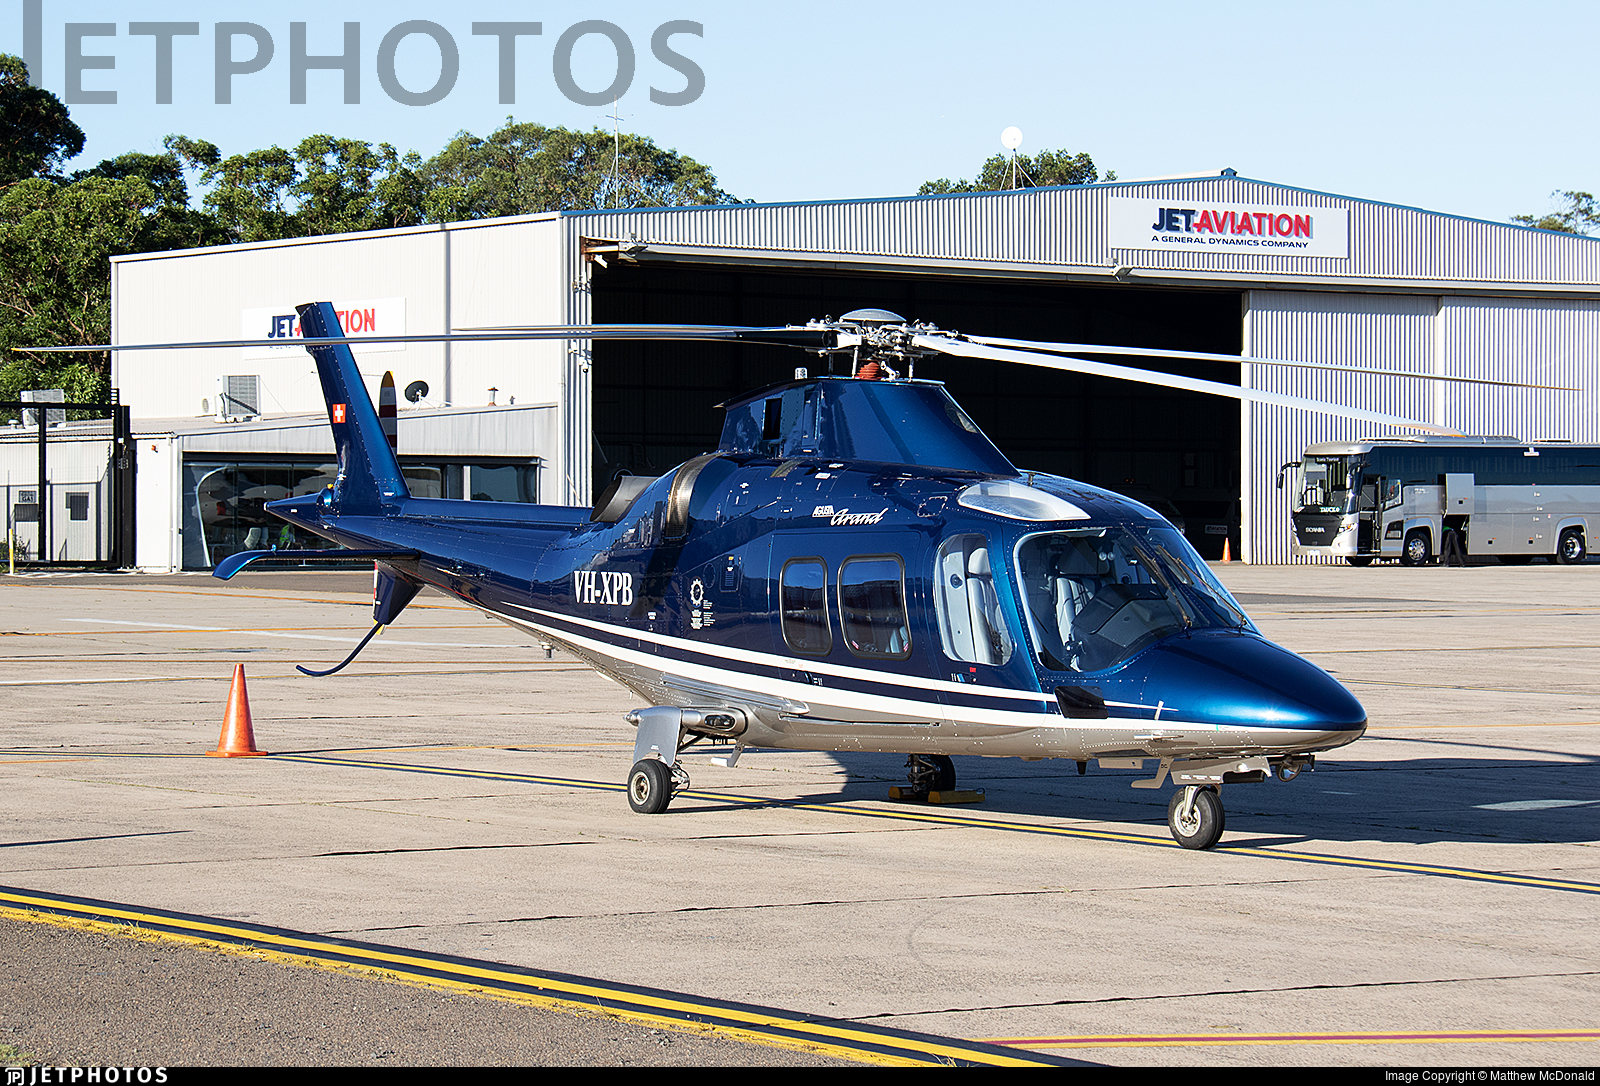 VH-XPB - Agusta A109S Grand - Private